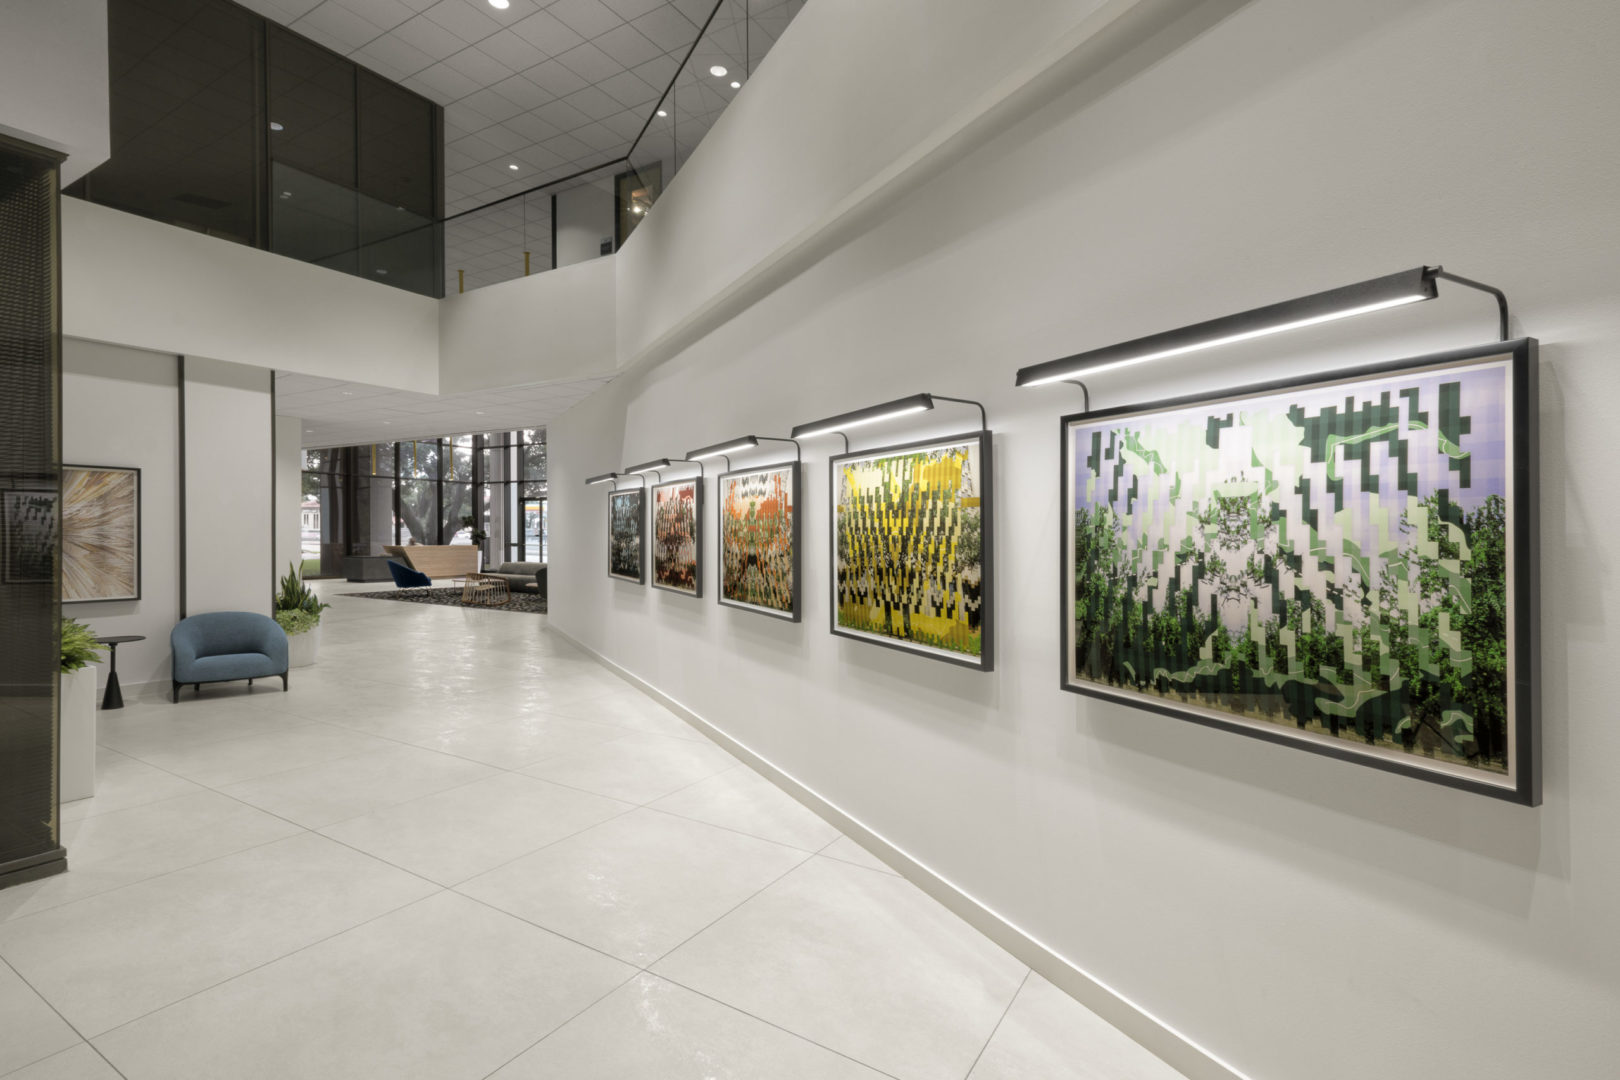 art wall interior hallway design